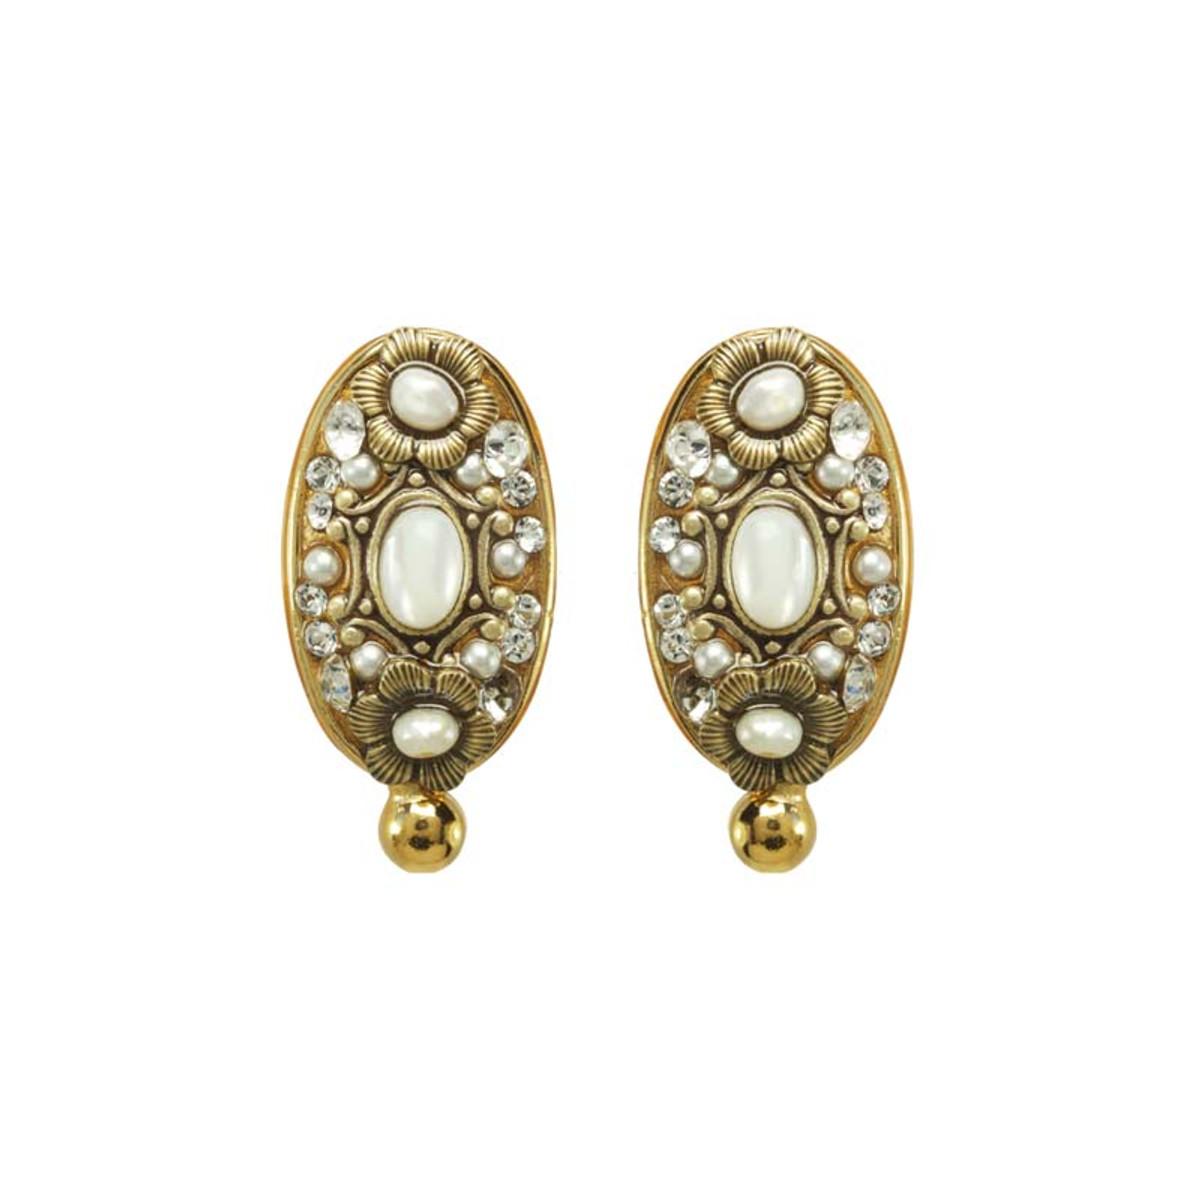 Michal Golan Elegante Style Earrings